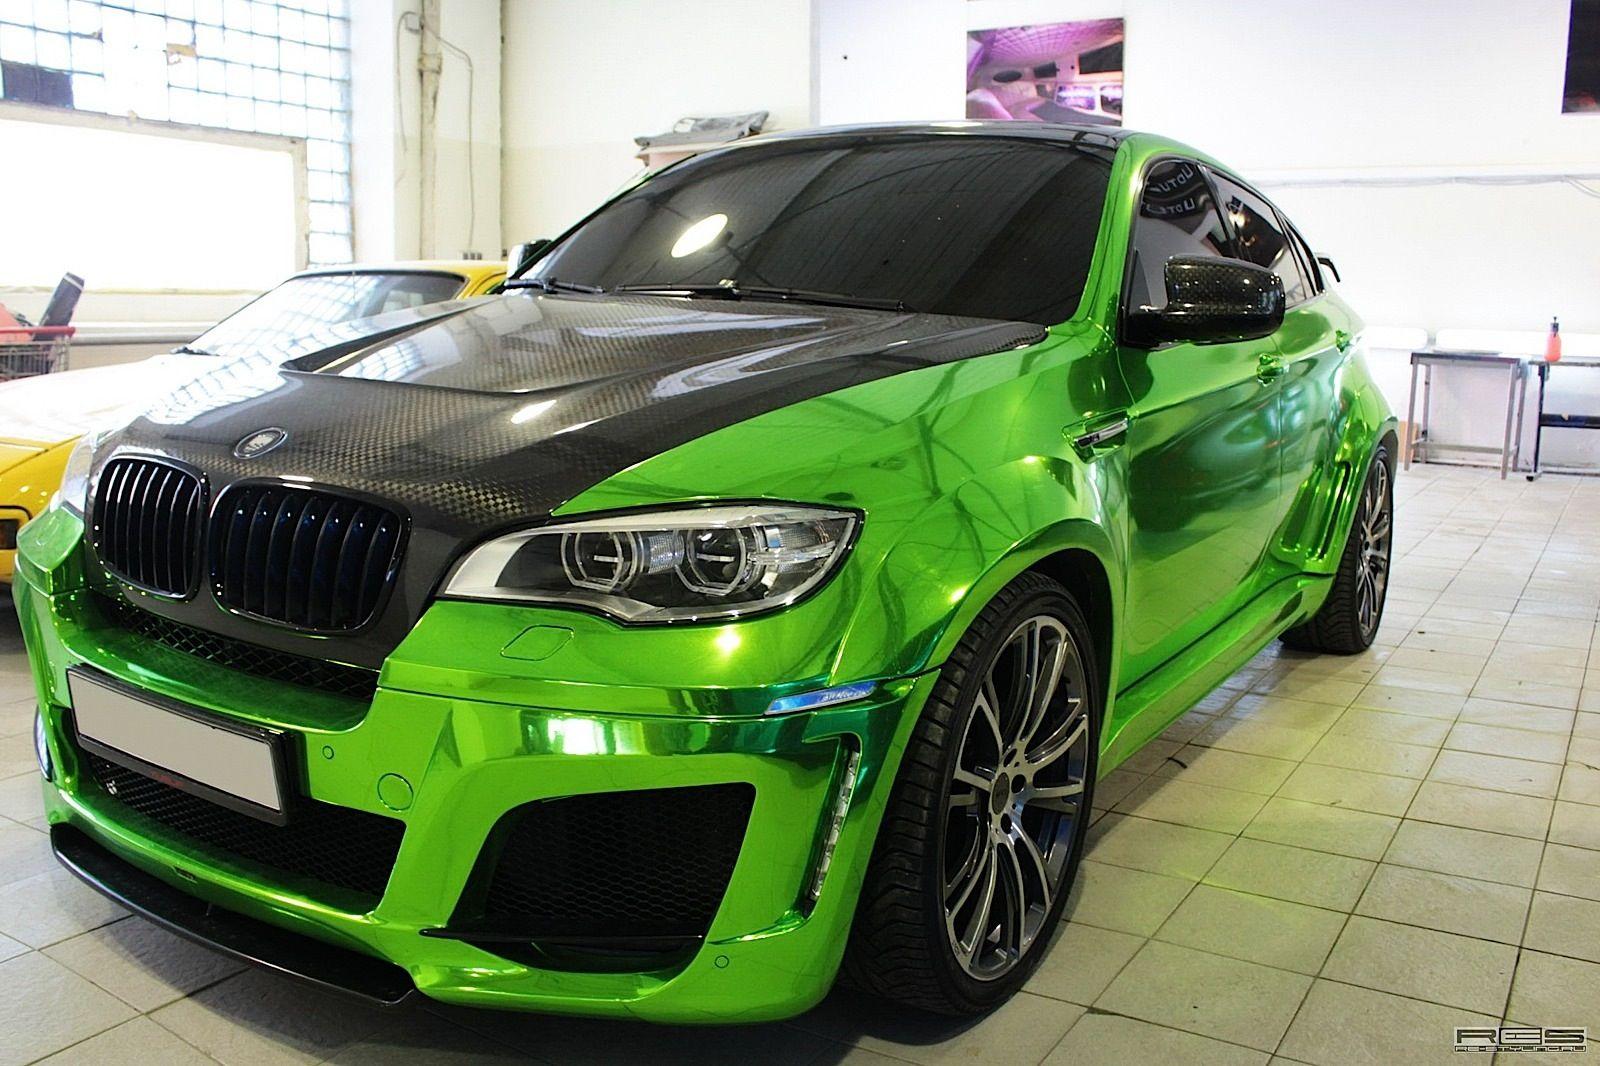 Bmw X6m Chrome Green Hulk Style 2 Dream Cars Wish List